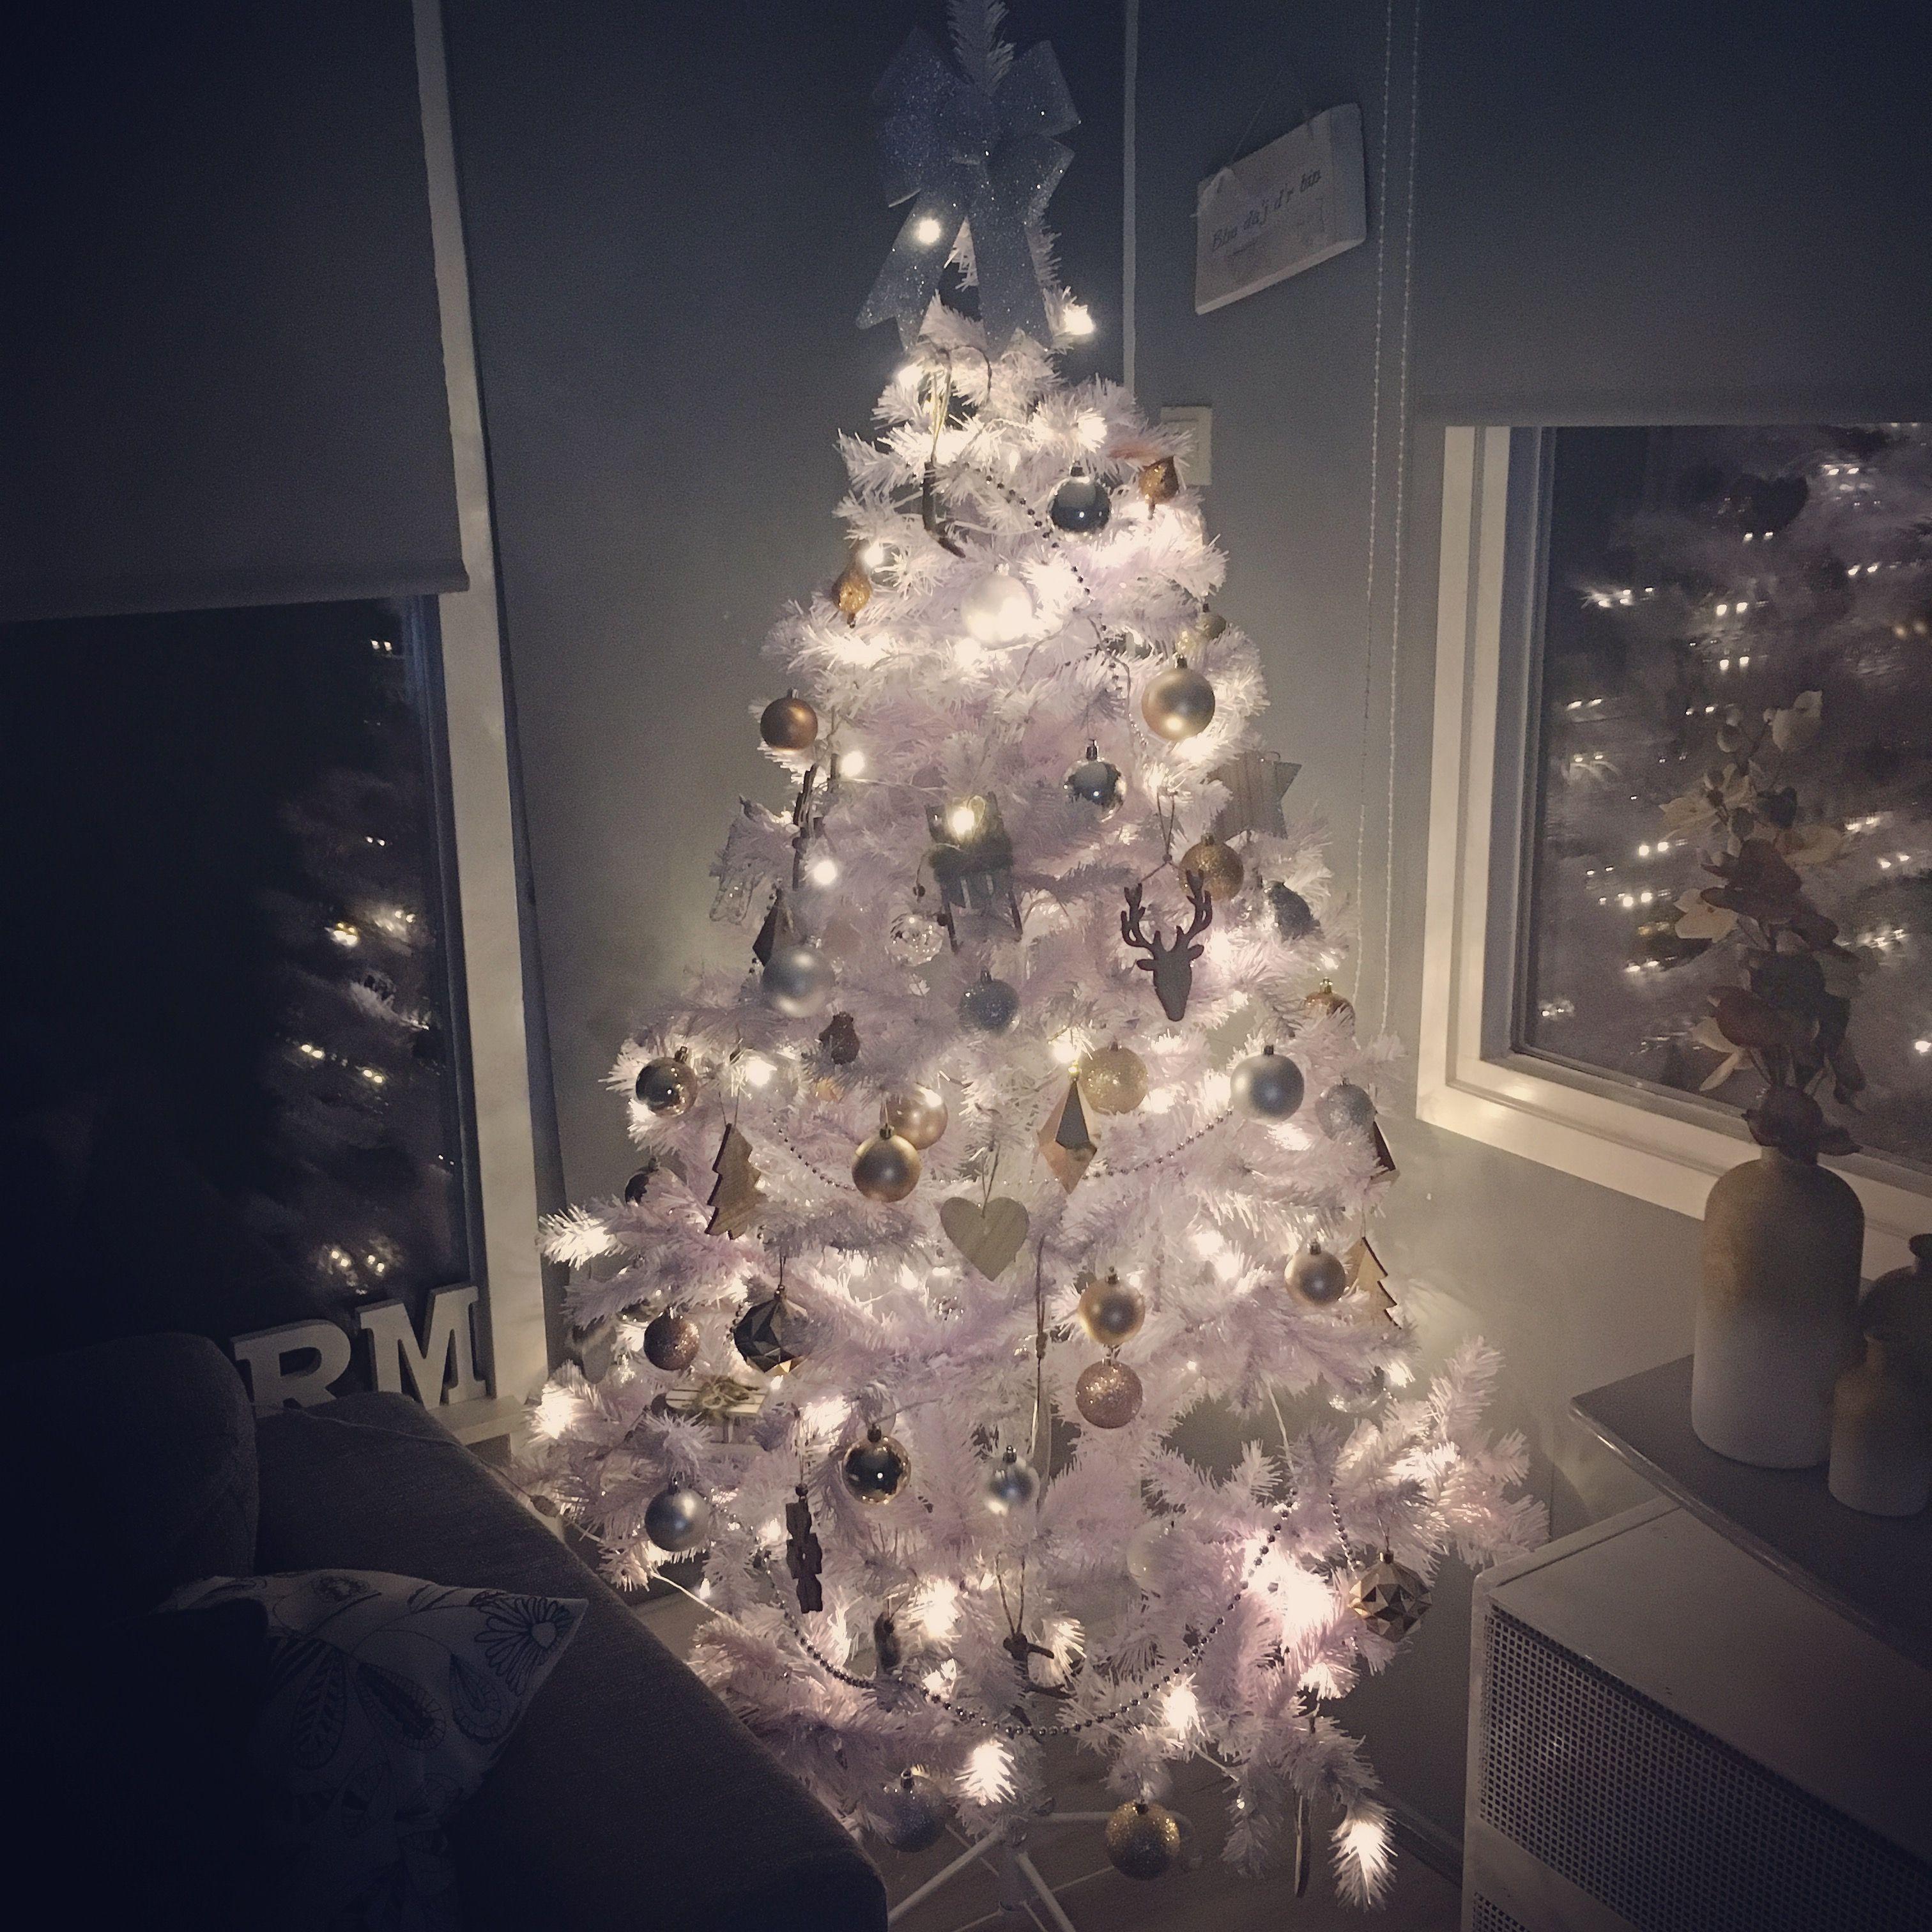 Witte Kerstboom Met Hout Zilver En Rose Decoratie Witte Kerstboom Decoratie Kerstboom